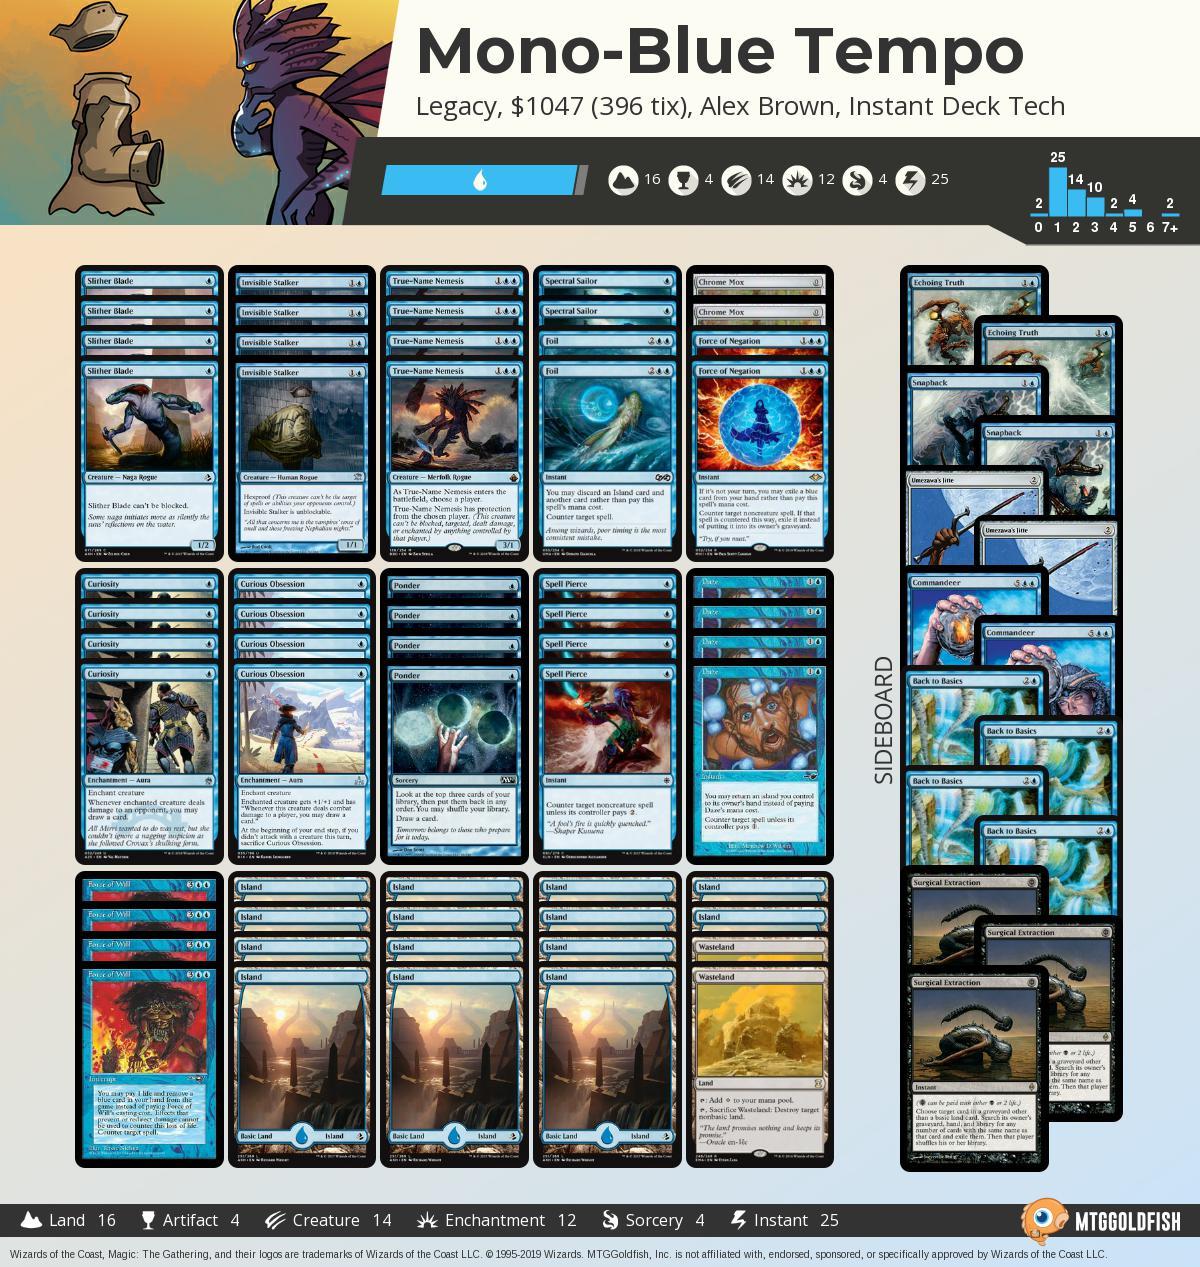 Mono blue%2btempo 9c4f9cc8 7f36 4c95 a03f 95926c587f6b%2ejpg